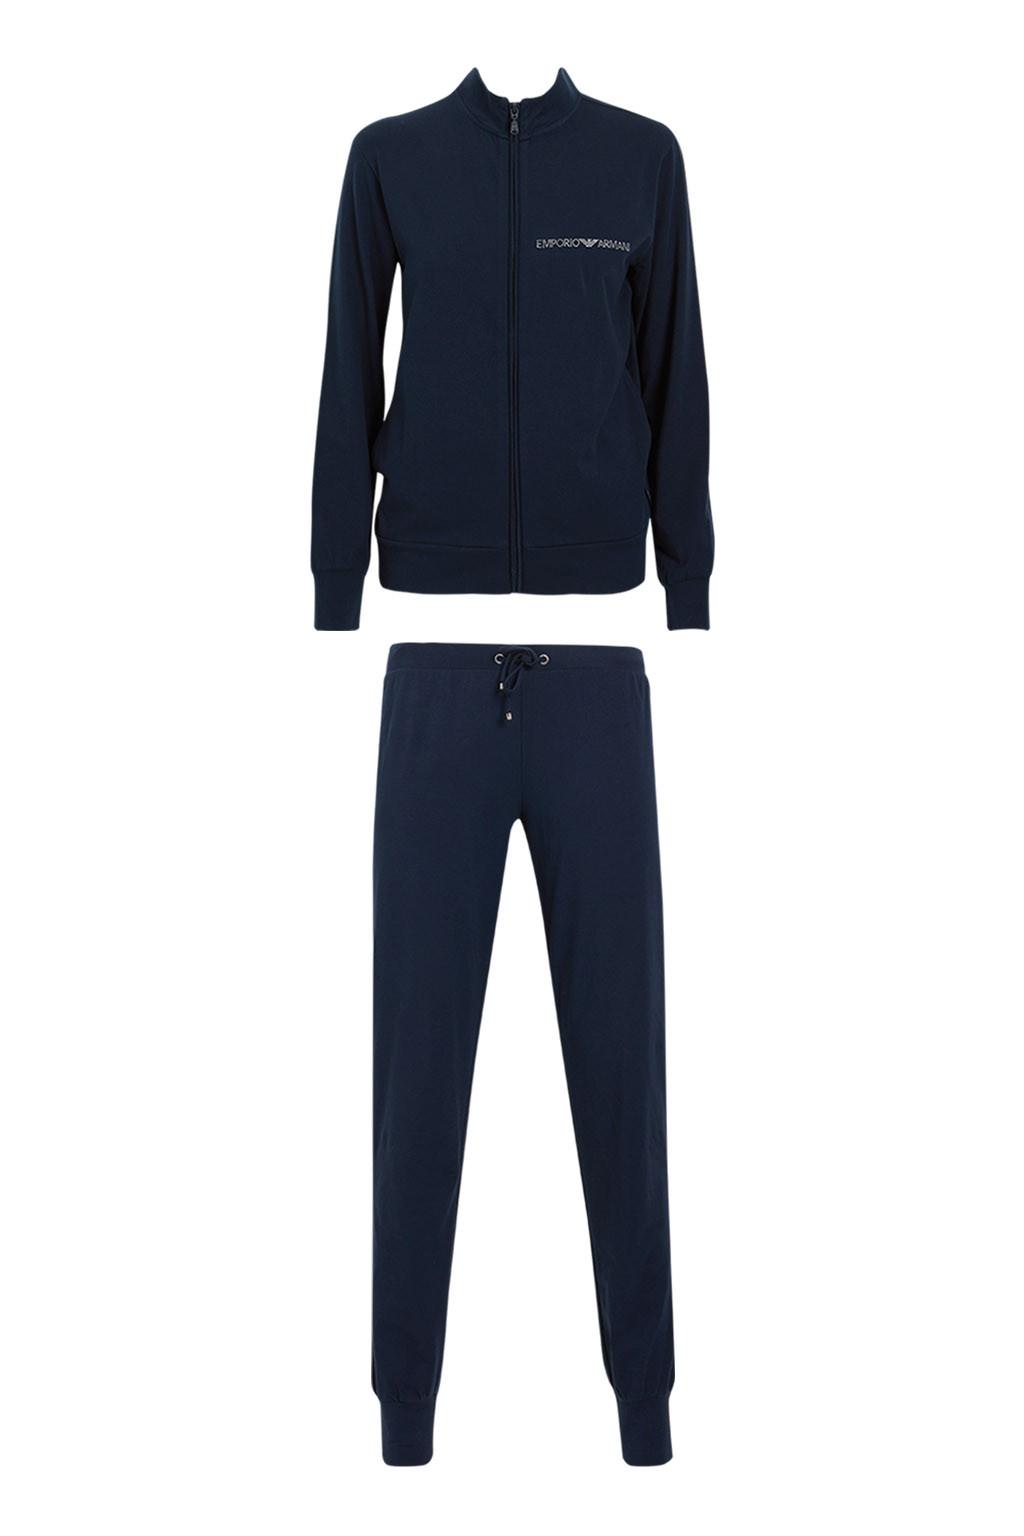 Dámské pyžamo 164146 CC270 00135 modrá - Emporio Armani modrá XL